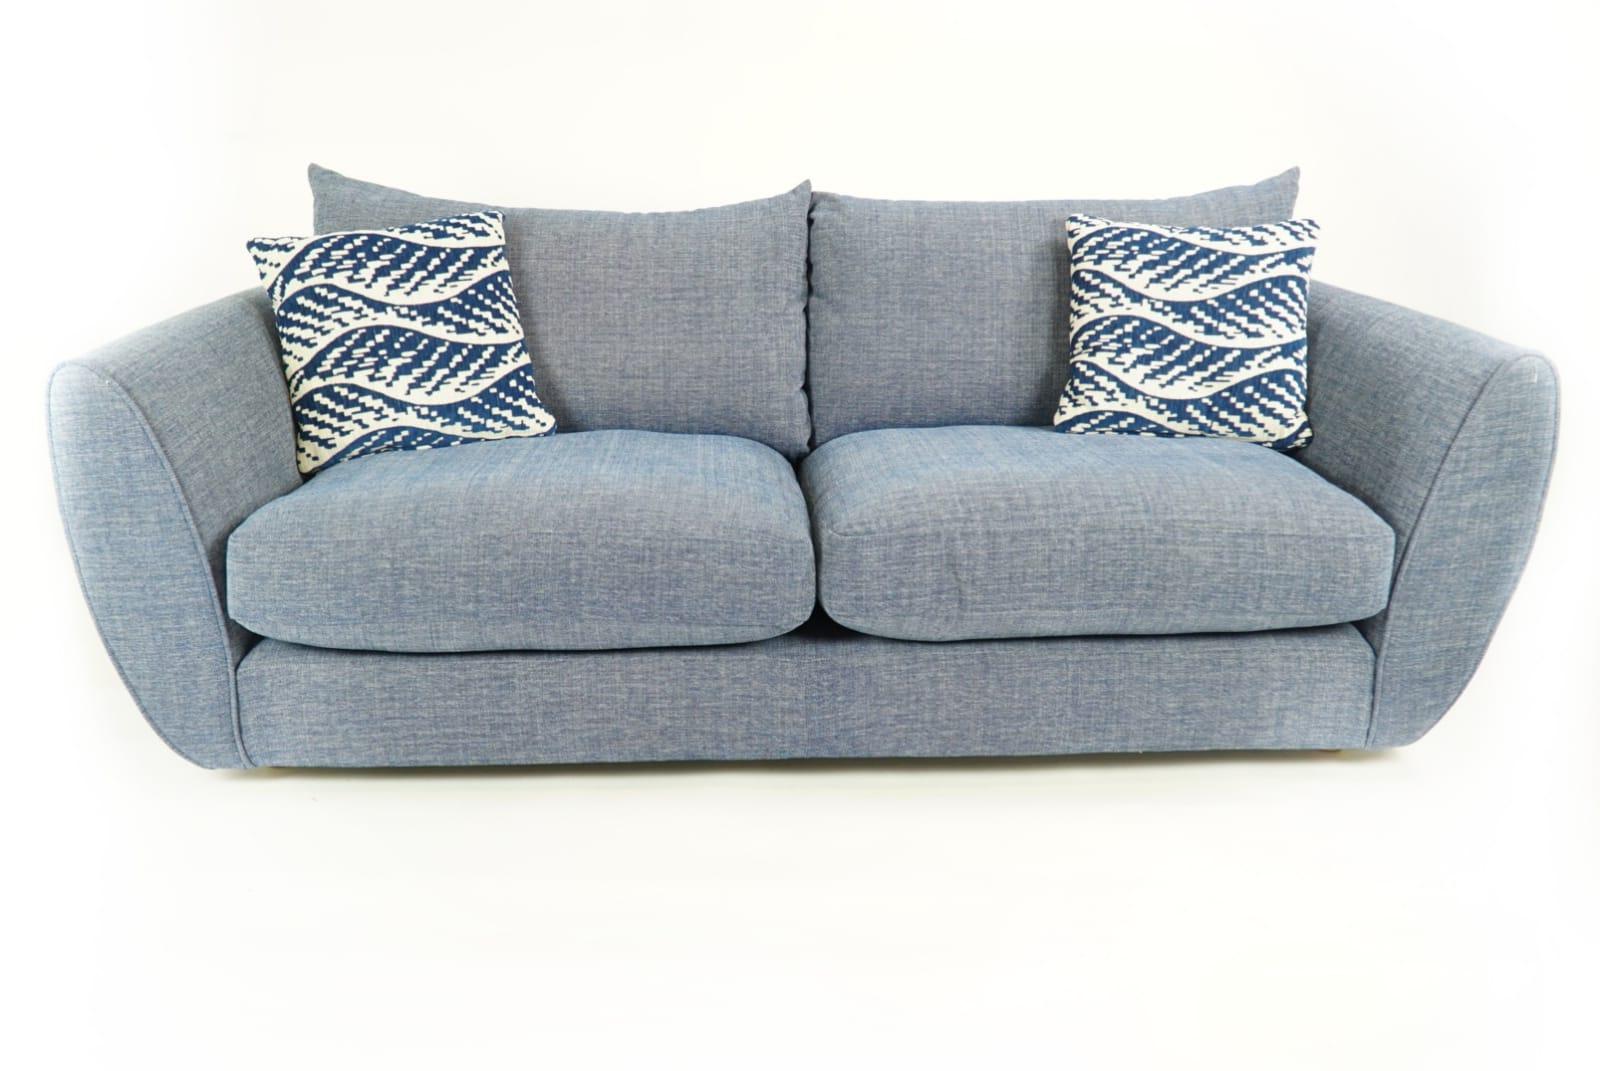 Nova Large Sofa Coast - OUTLET